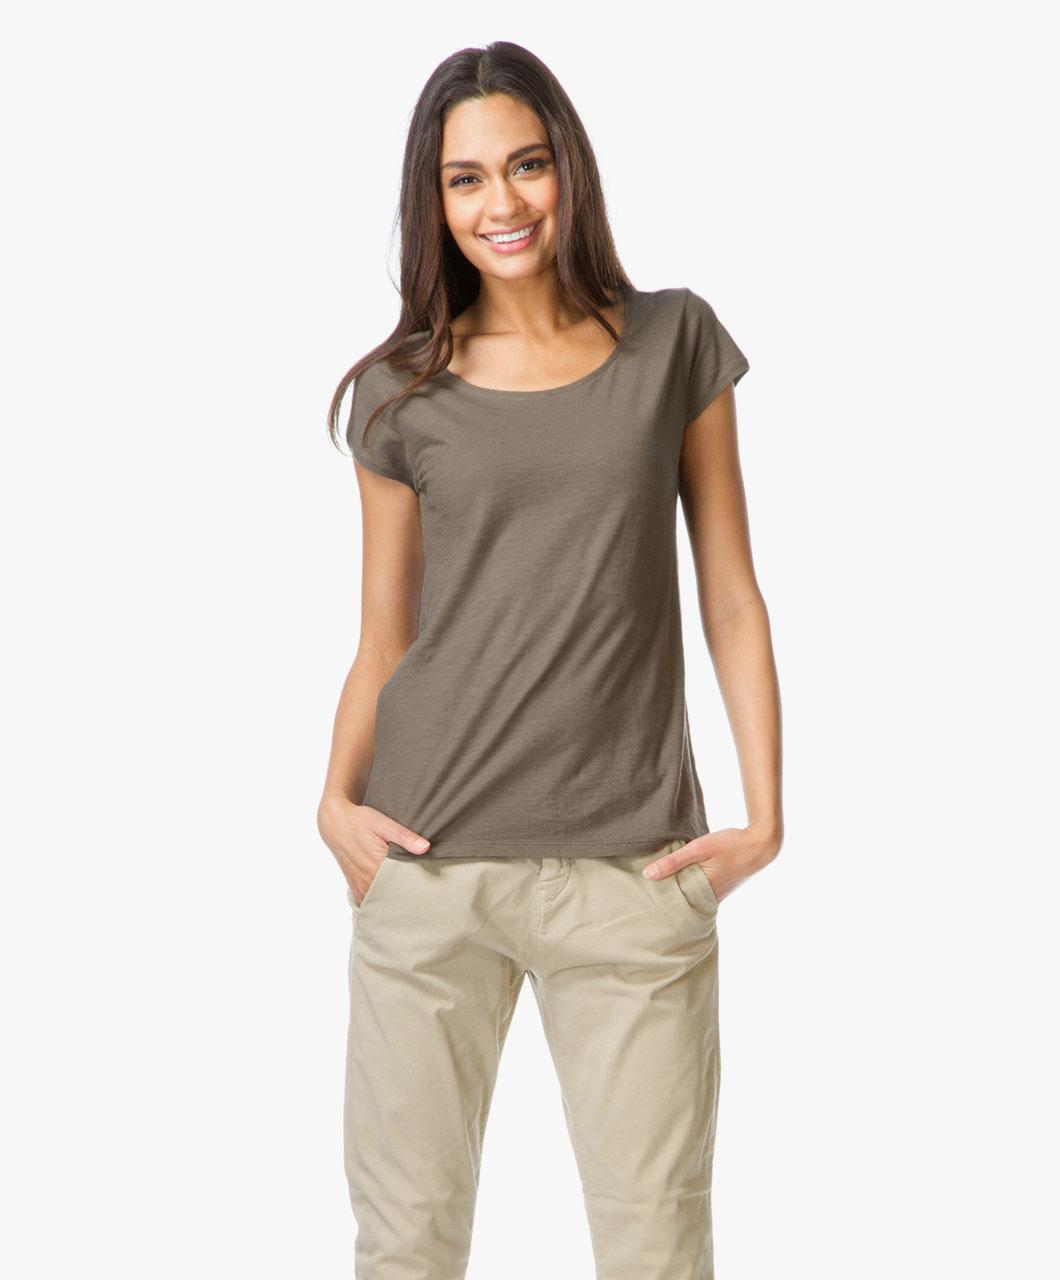 drykorn cotton aviva t shirt khaki green aviva 506100 11 khaki. Black Bedroom Furniture Sets. Home Design Ideas